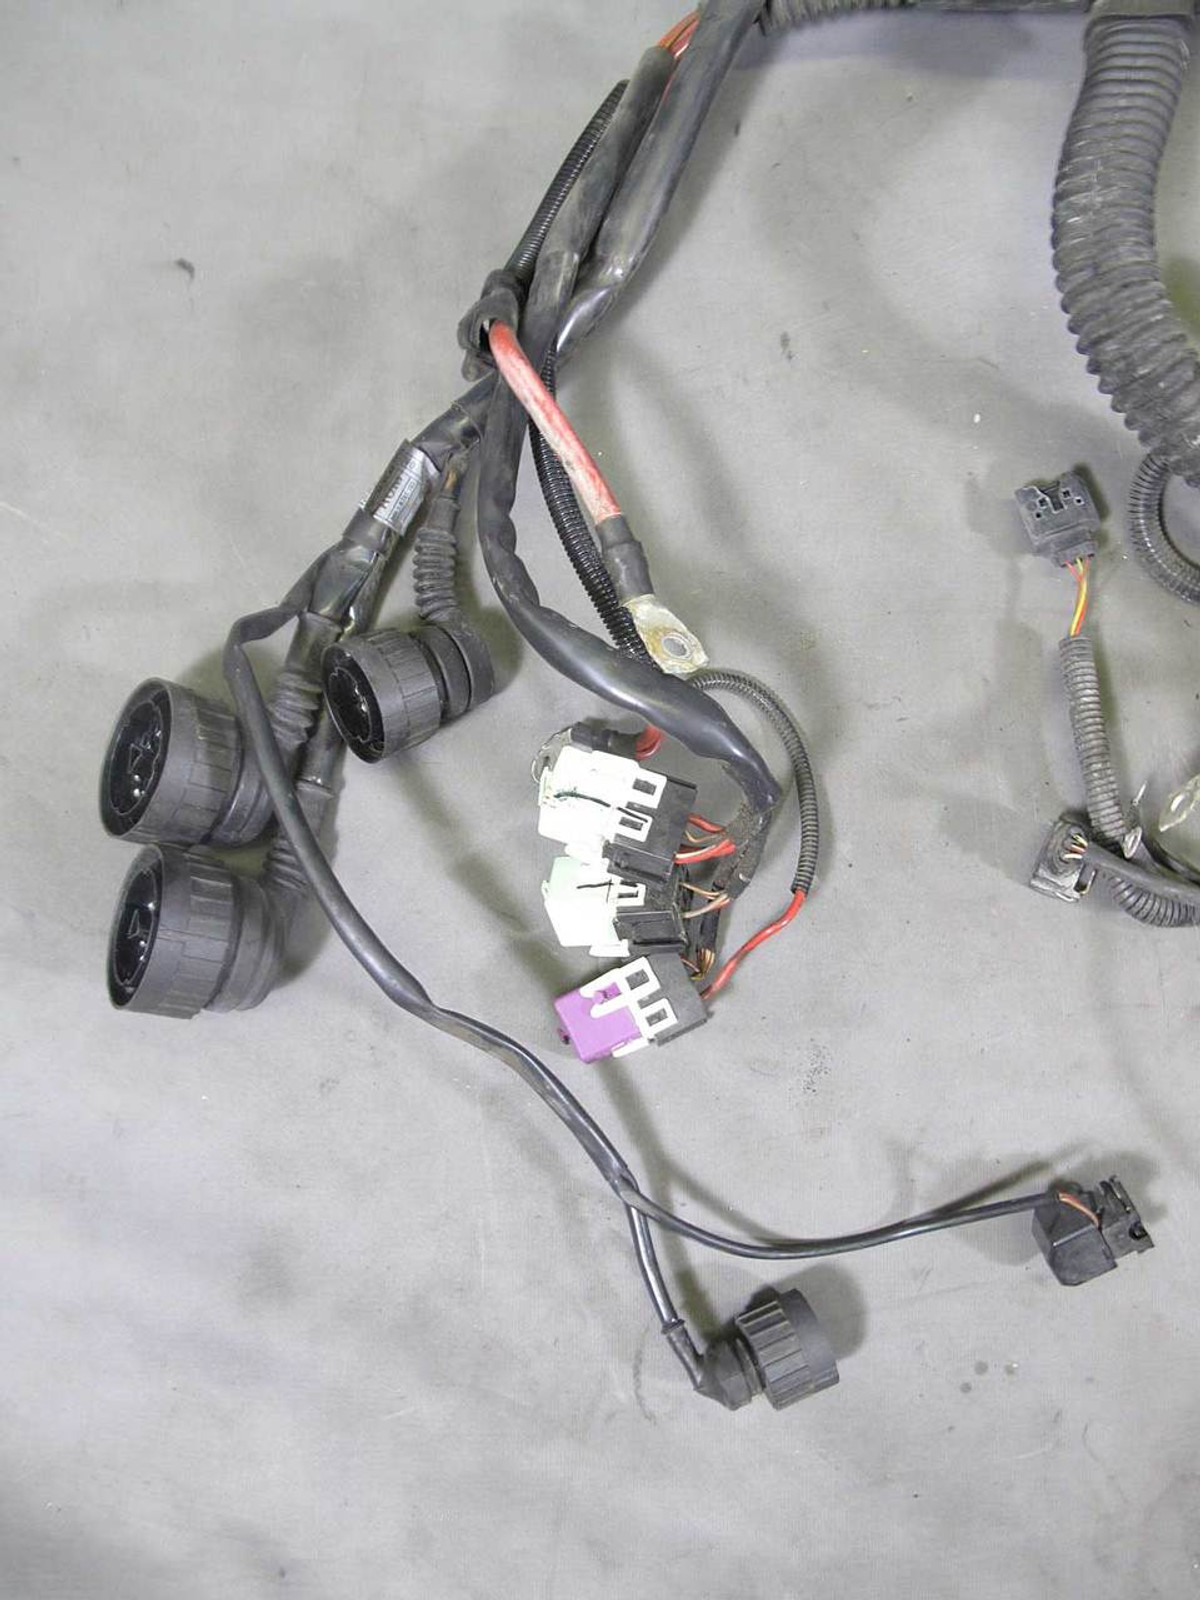 toyota wire harness repair manual 1 wiring diagram source wire harness sxf dirt bike no keysxdirtbikewiringjpg [ 960 x 1280 Pixel ]